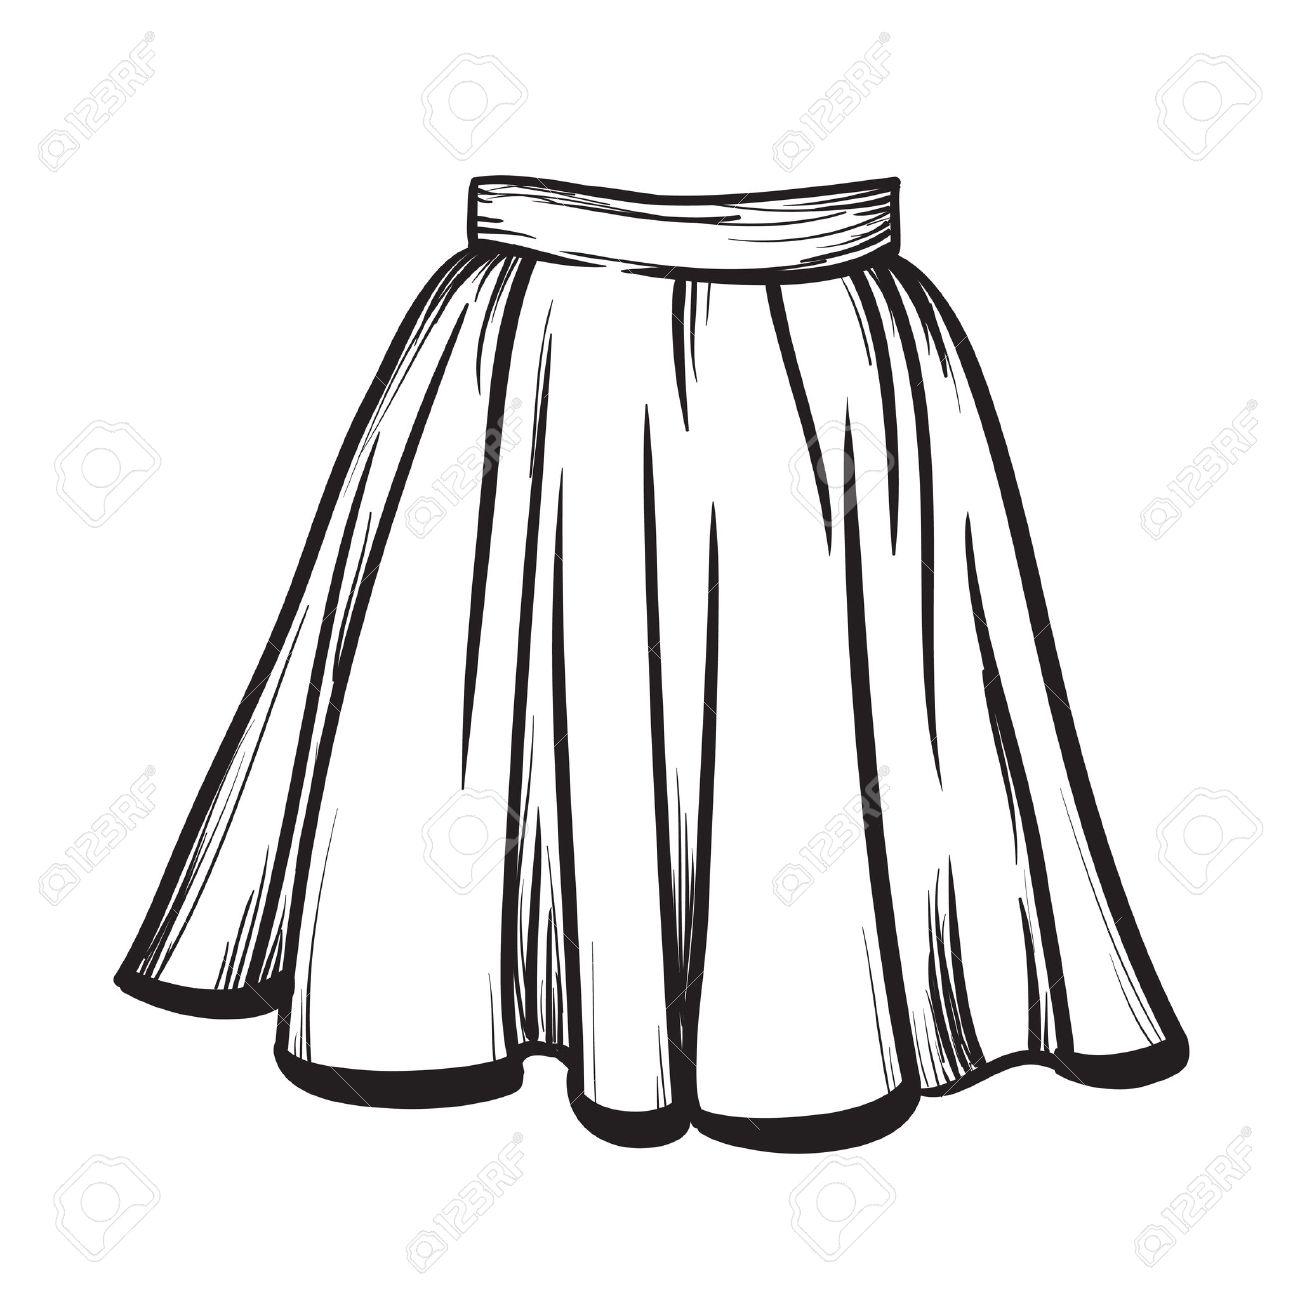 Stylish skirt model hand drawn vector illustration black lines - 53033404